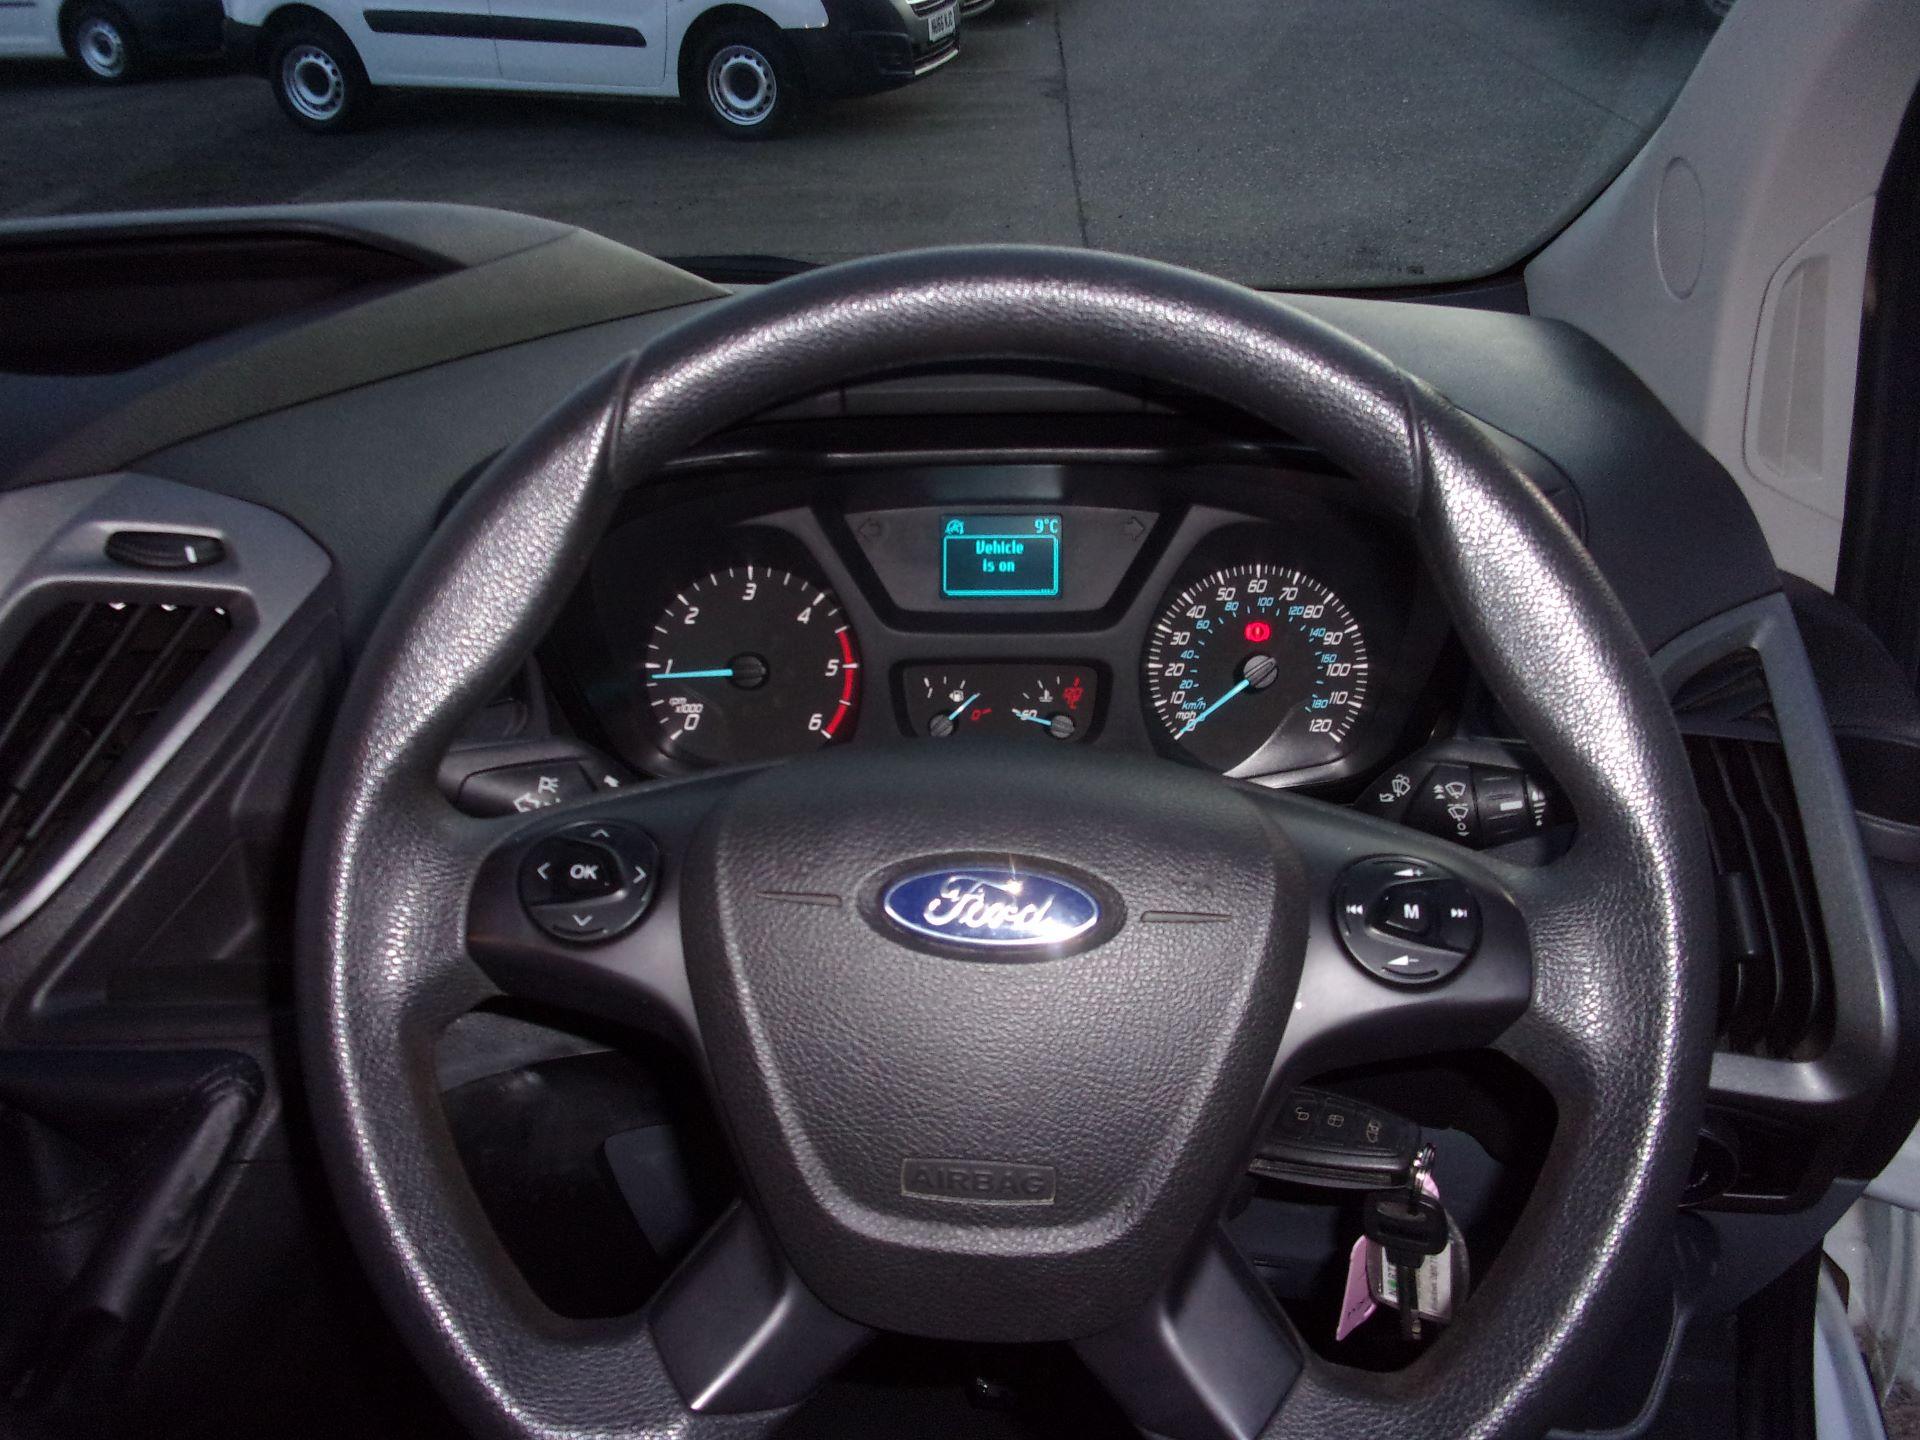 2017 Ford Transit Custom 310 L2 DIESEL FWD 2.0 TDCI 130PS LOW ROOF KOMBI EURO 6 (FG67ERU) Image 8